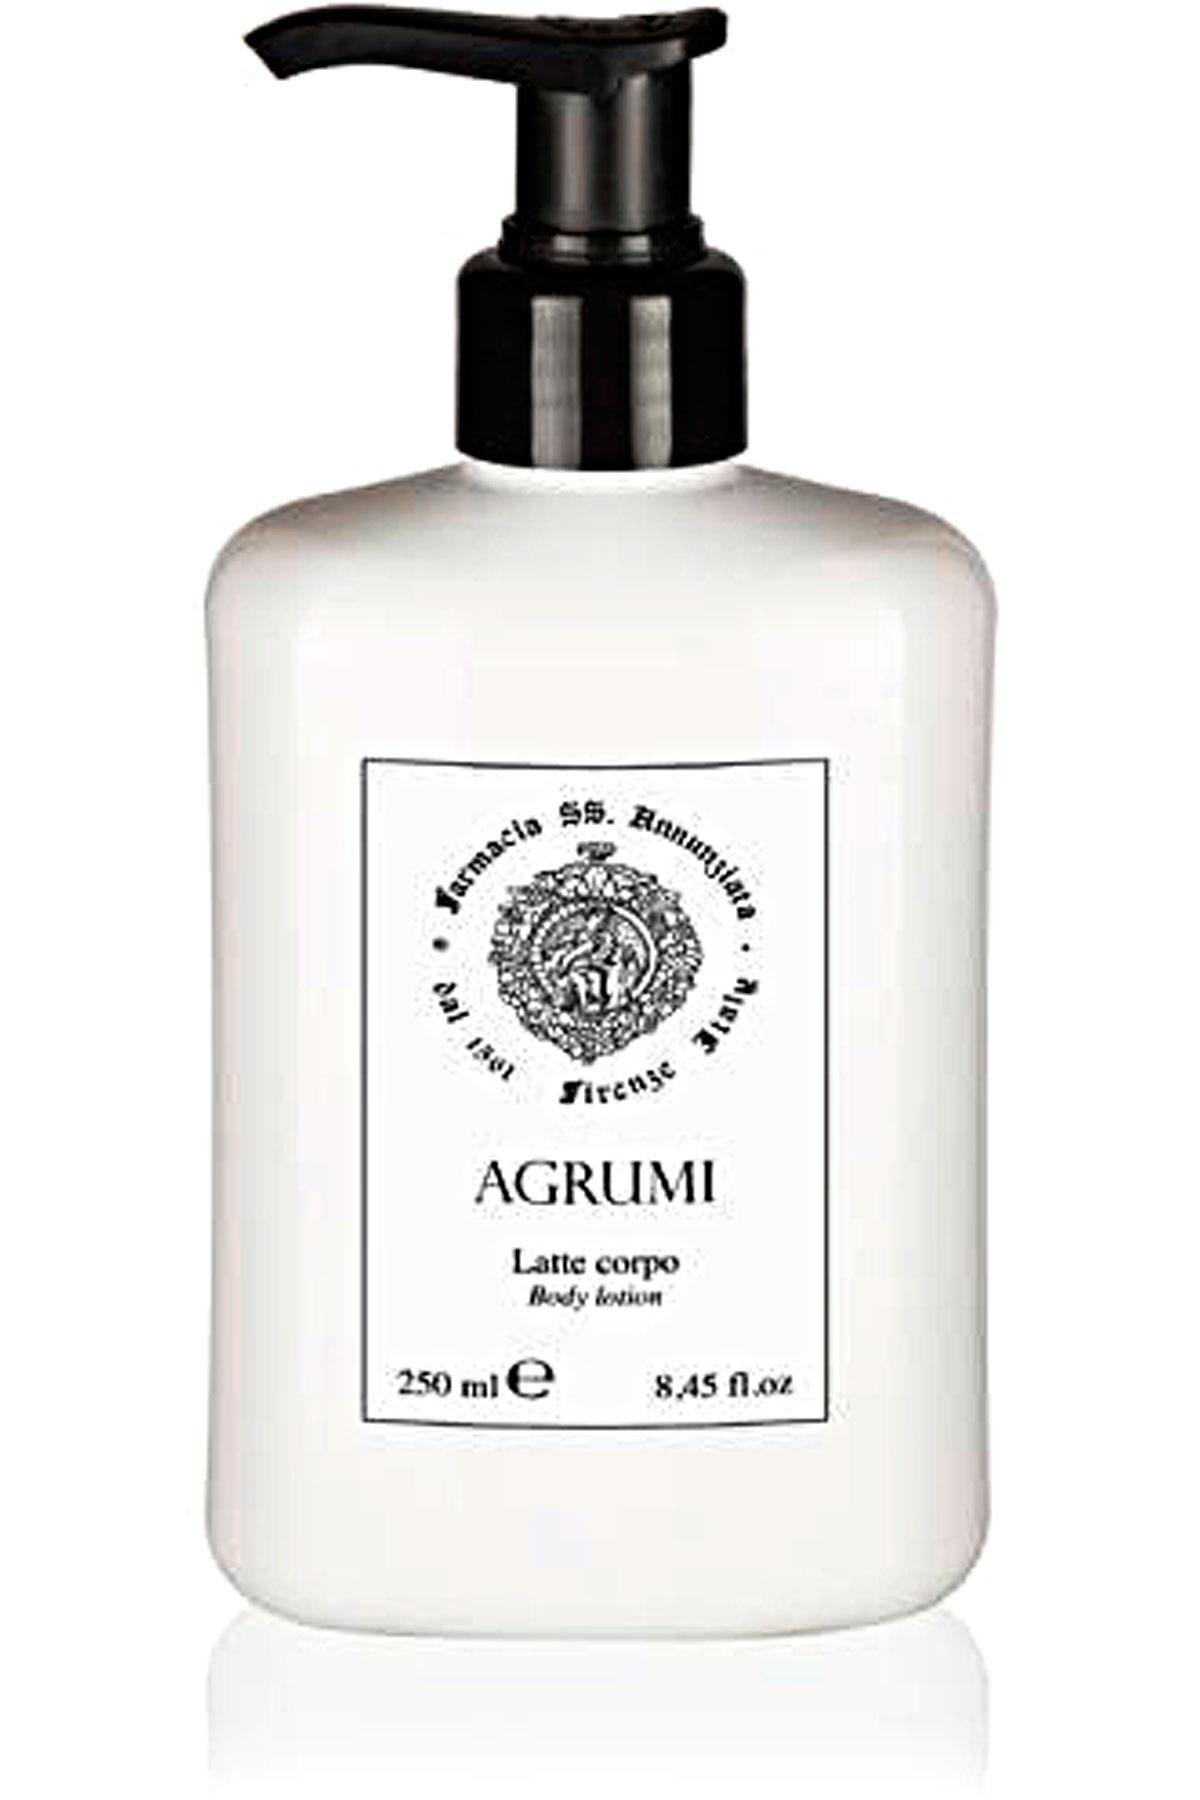 Farmacia Ss Annunziata 1561 Beauty for Women On Sale, Agrumi - Body Milk - 250 Ml, 2019, 250 ml